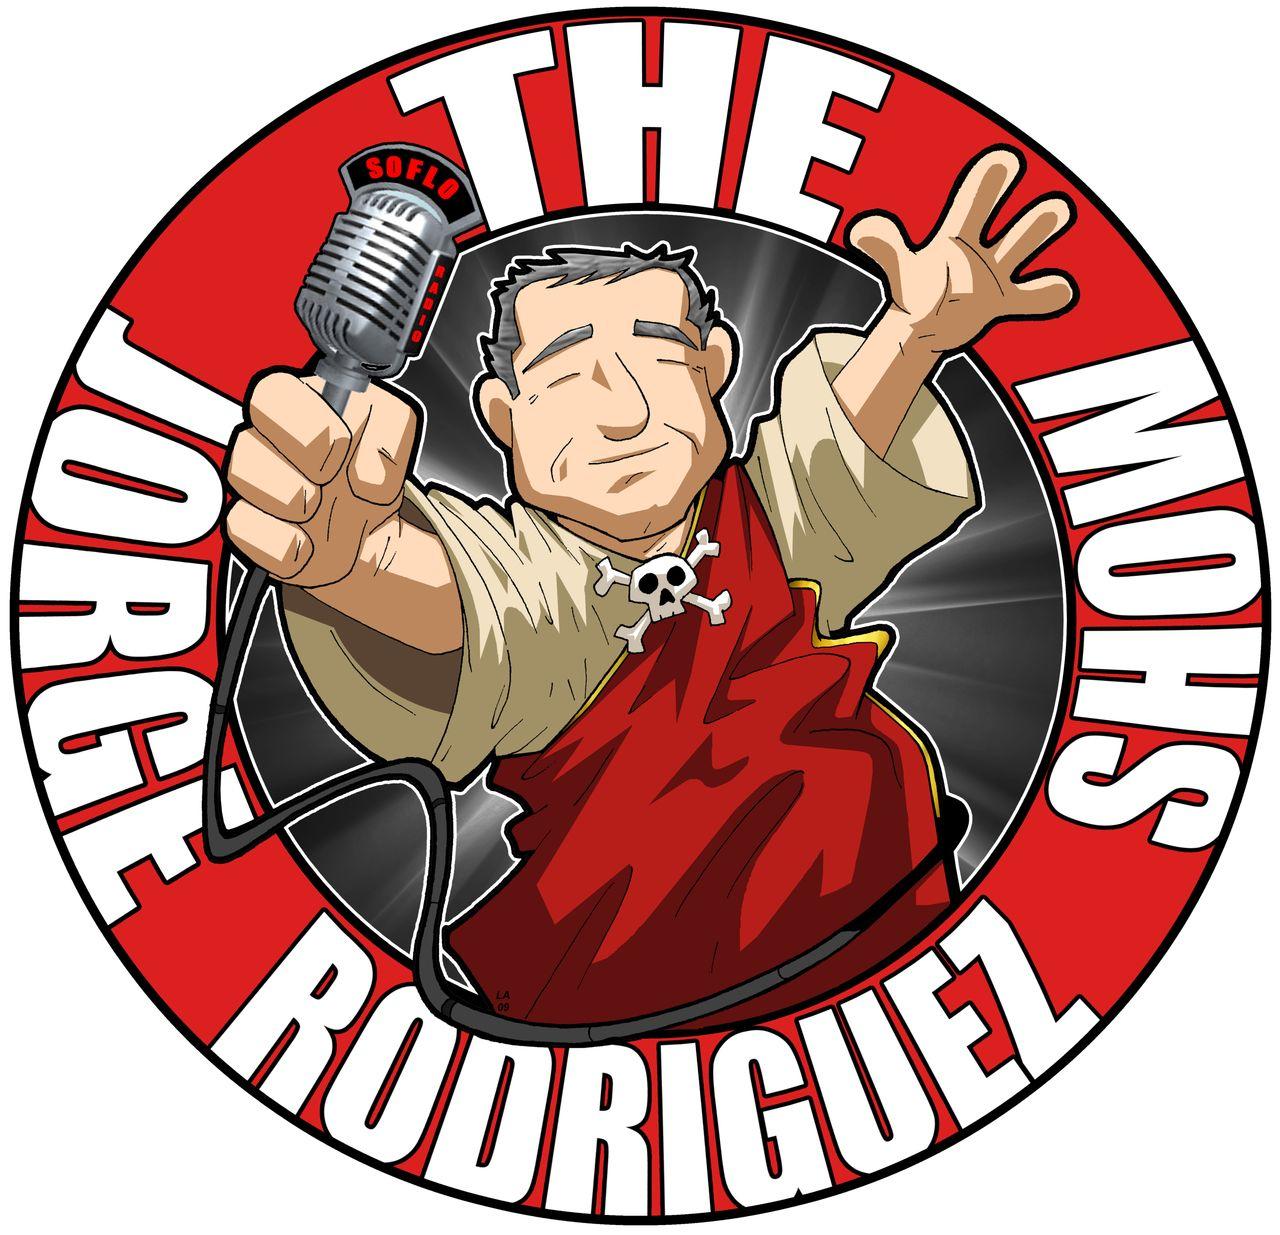 The Jorge Rodriguez Show 06. 20. 14